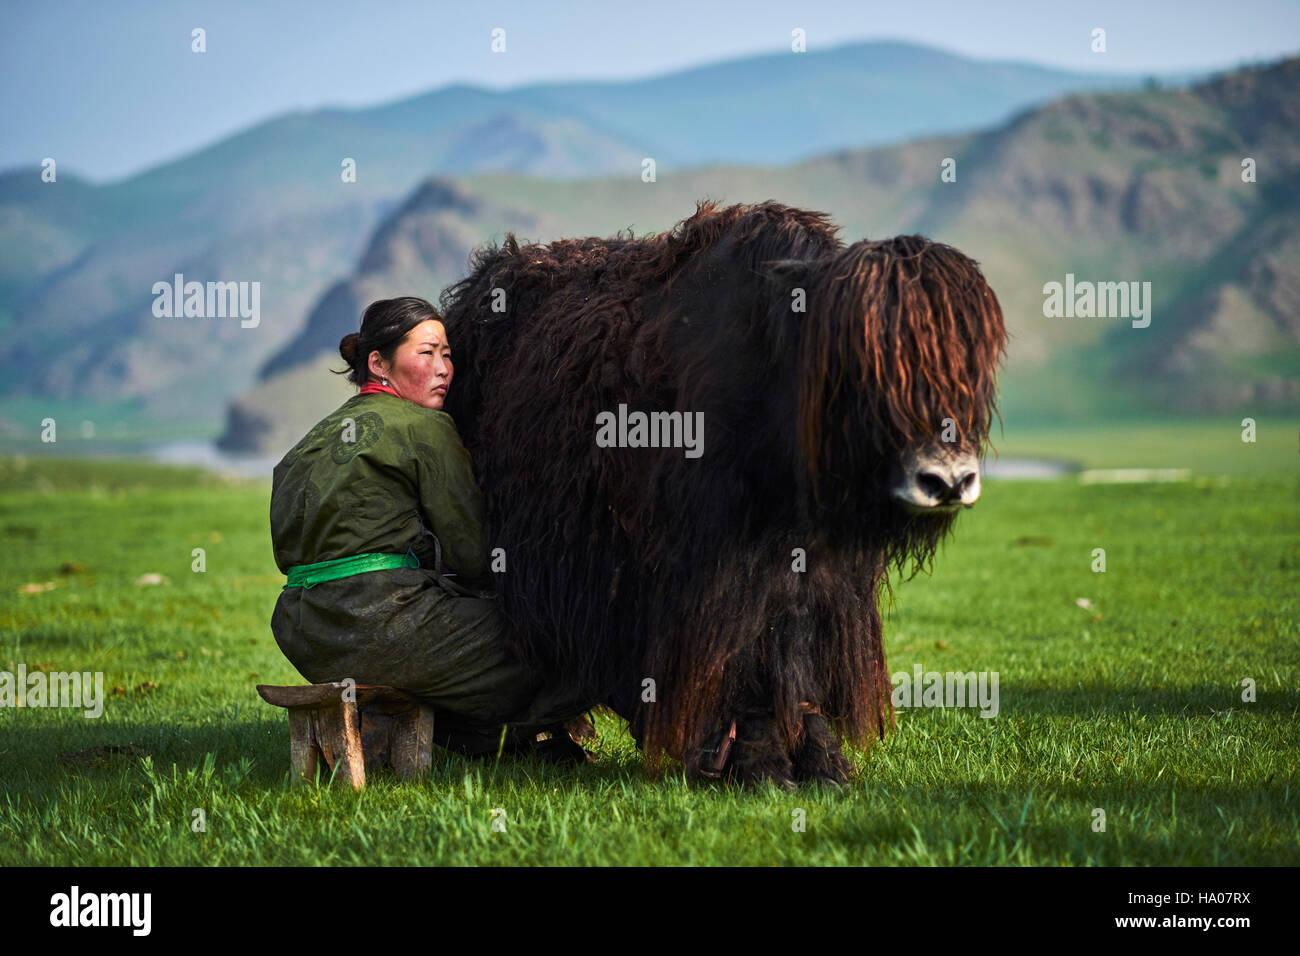 Mongolia, Ovorkhangai provincia, Orkhon valley, campo nomadi, yak mungitura Immagini Stock